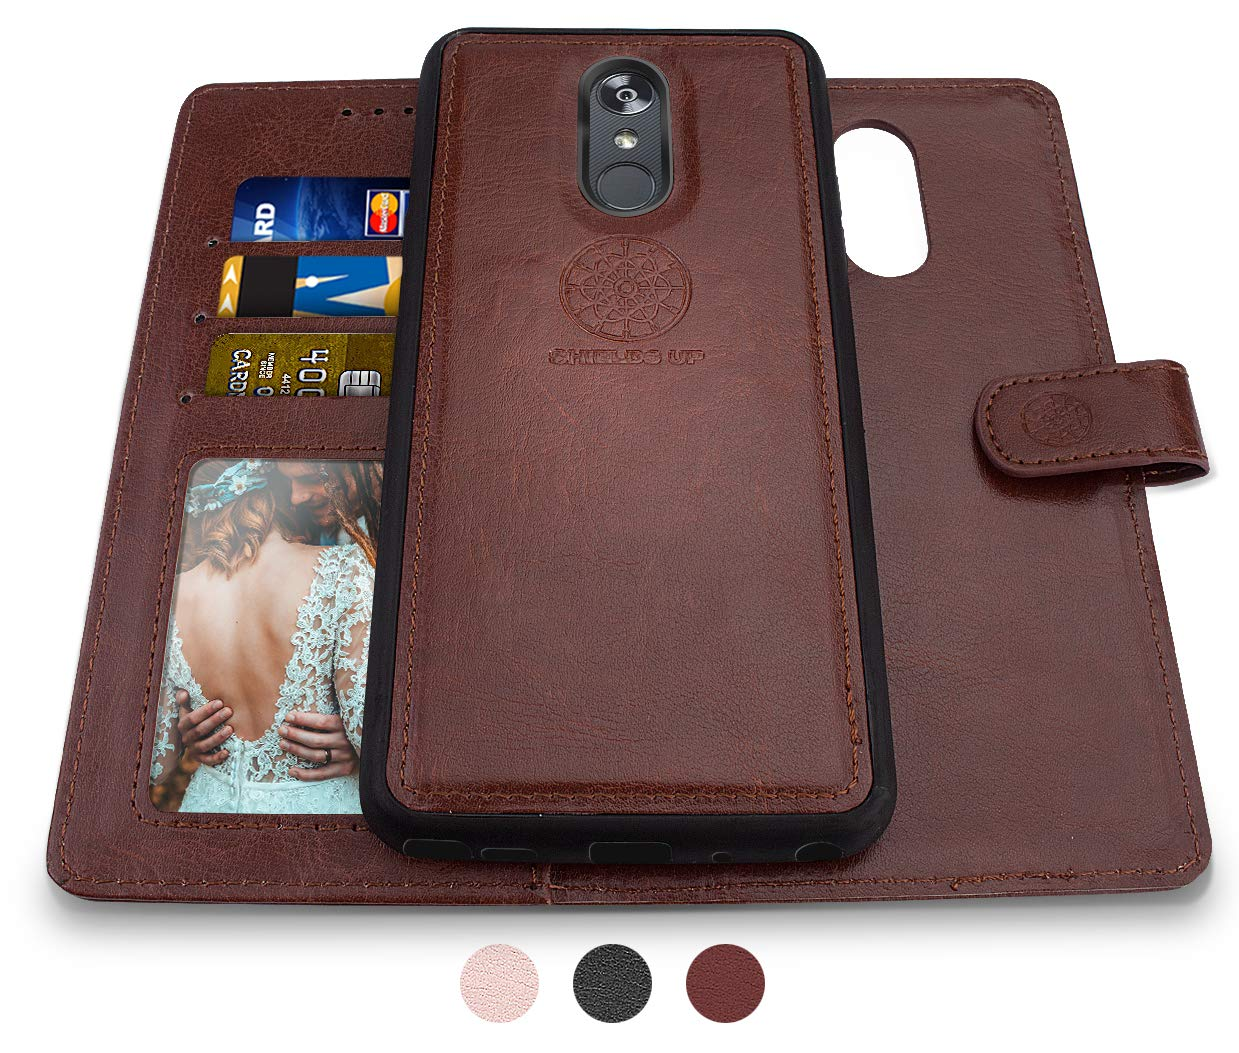 LG Stylo 4 Wallet Case, LG Stylo 4 Plus Case, LG Q Stylus Case, Shileds Up [Detachable] Slim Magnetic Case, Card/Cash Slots, [Vegan Leather] Cover for LG Stylo 4 Plus -Brown